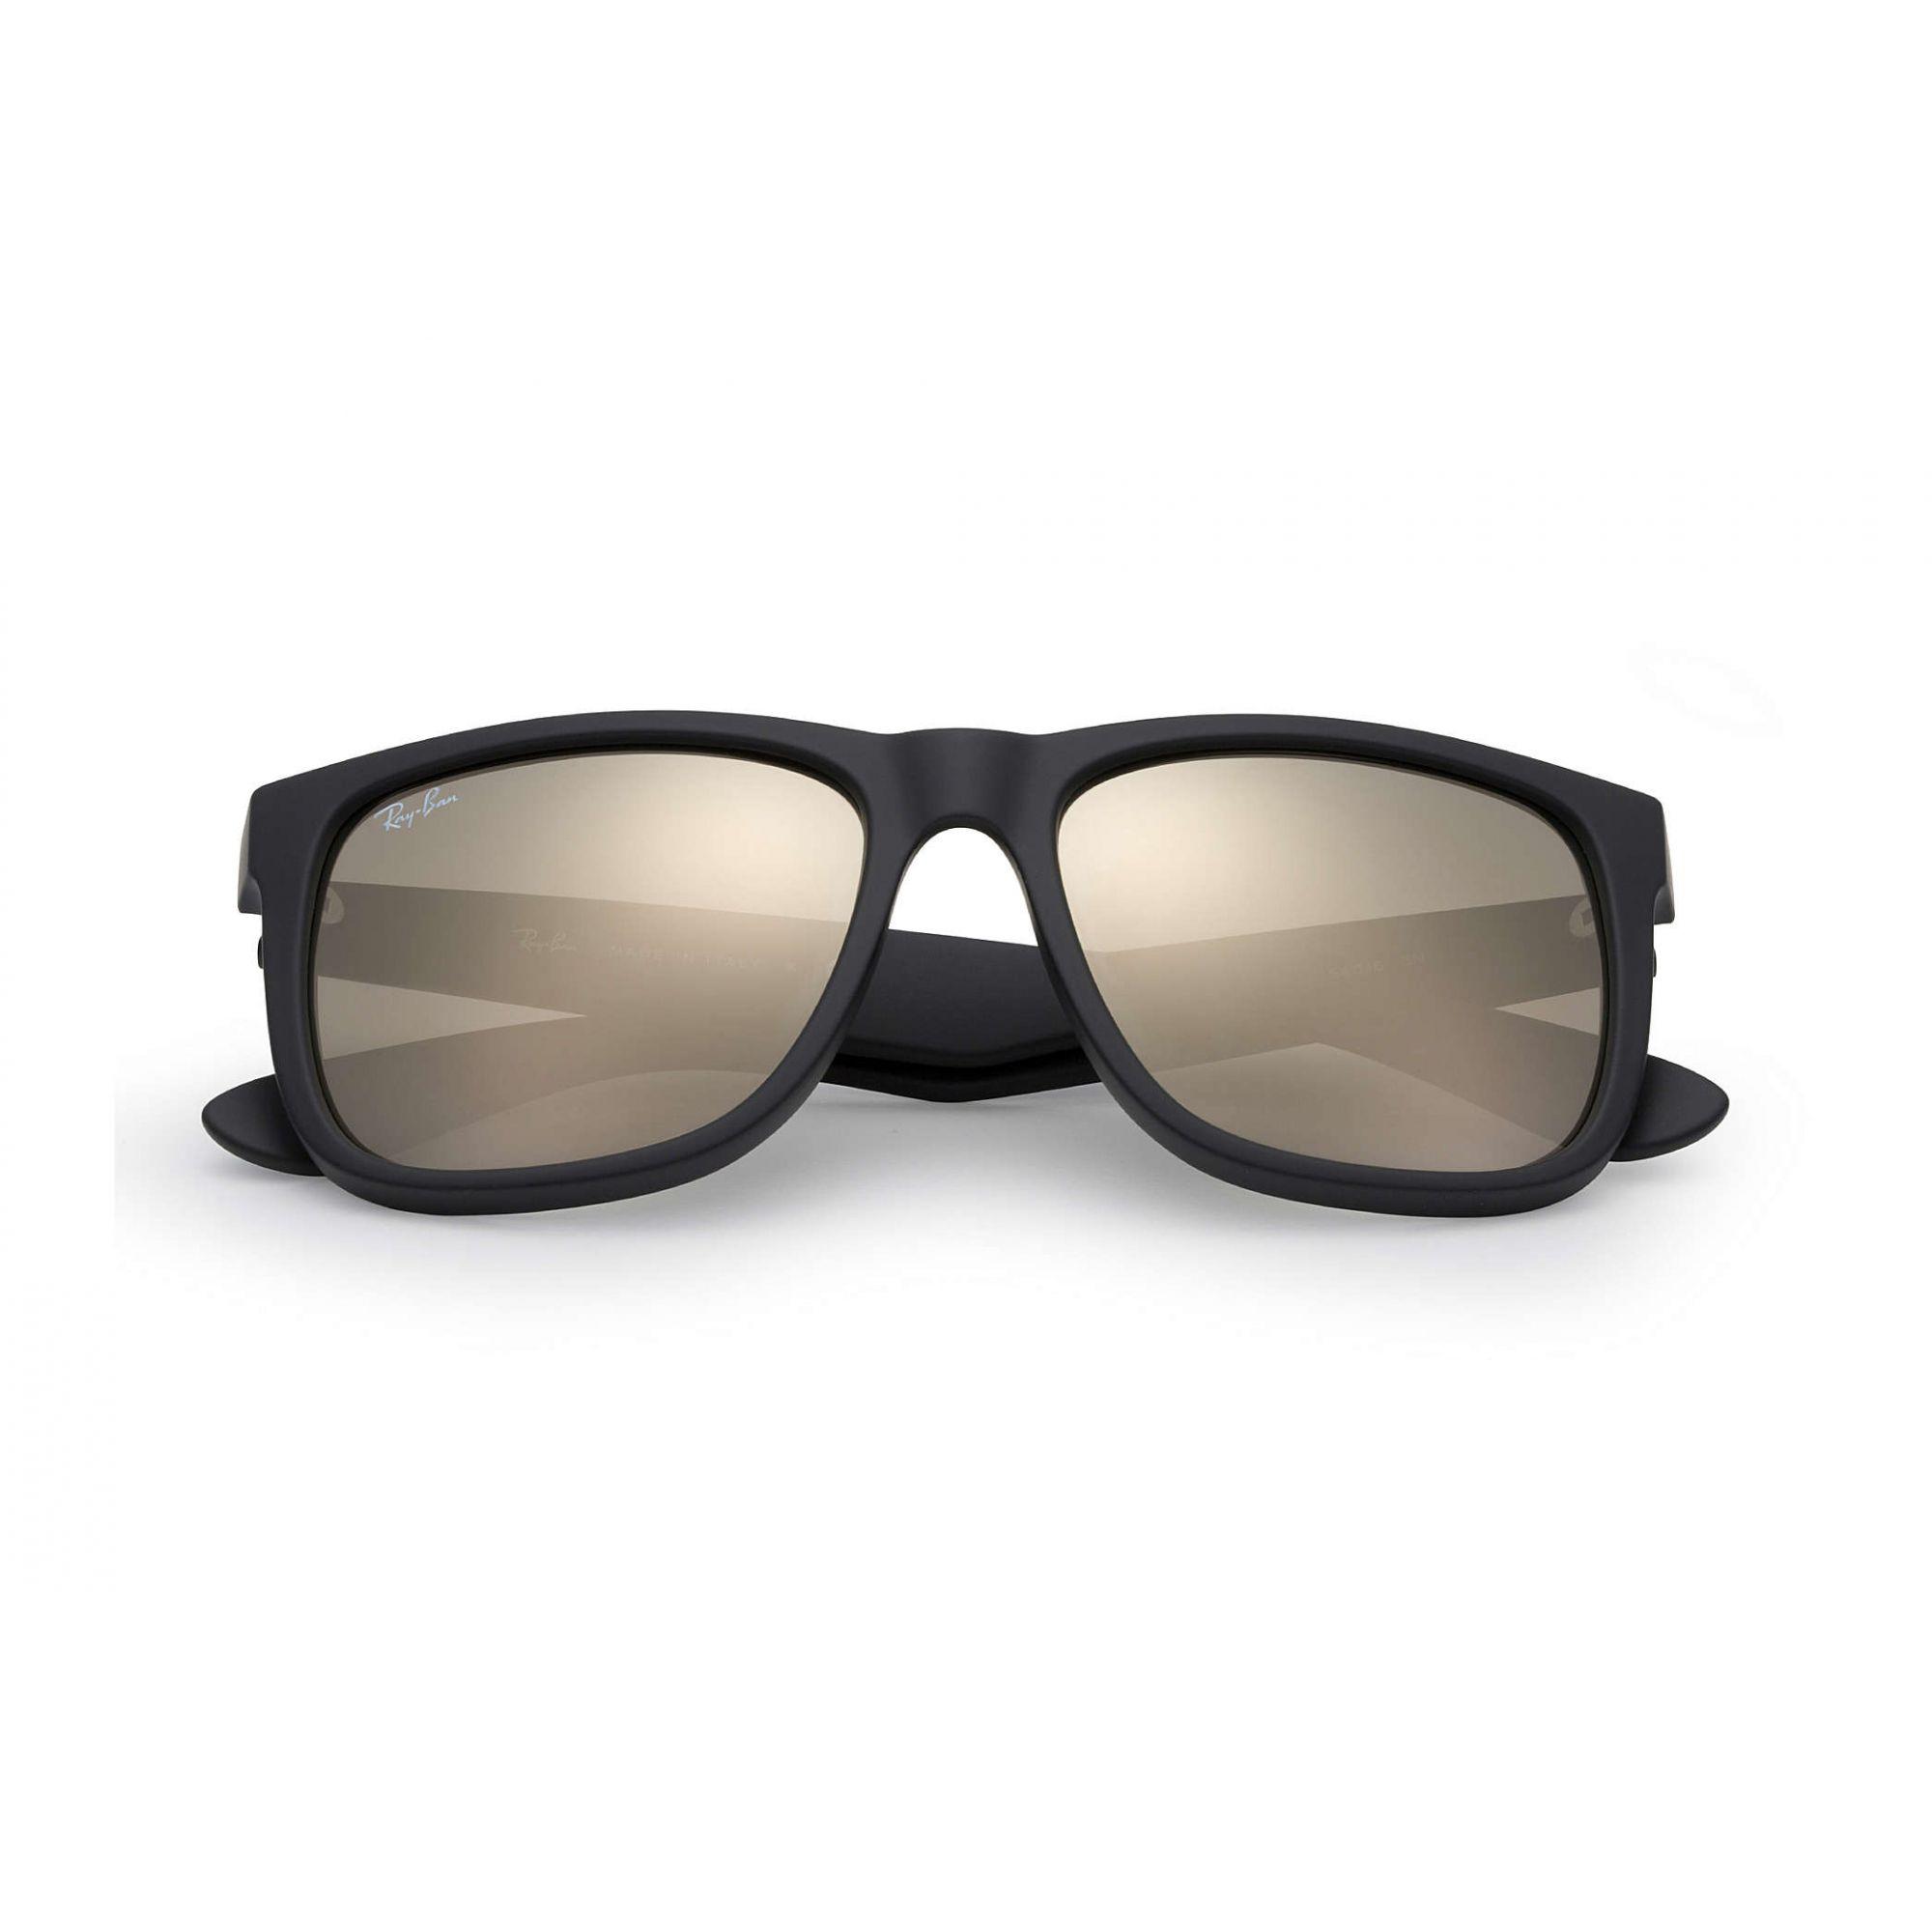 Ray Ban - RB4165 6225A51 - Óculos de sol